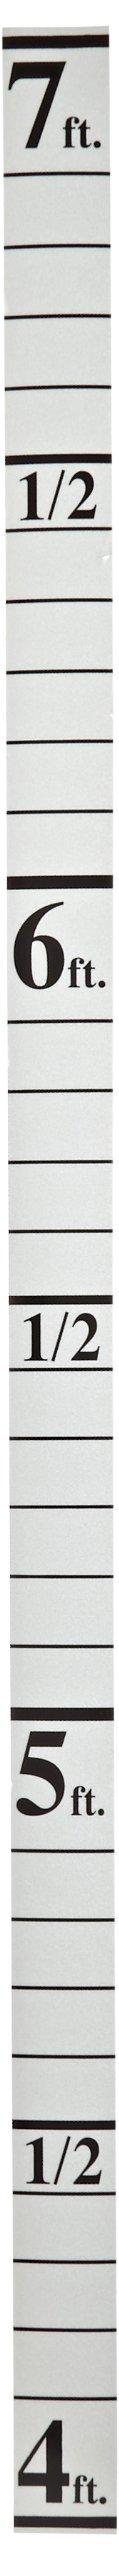 Brady 103650   1 1/2'' Widthide Reflective Indicator Tape (1 Roll)